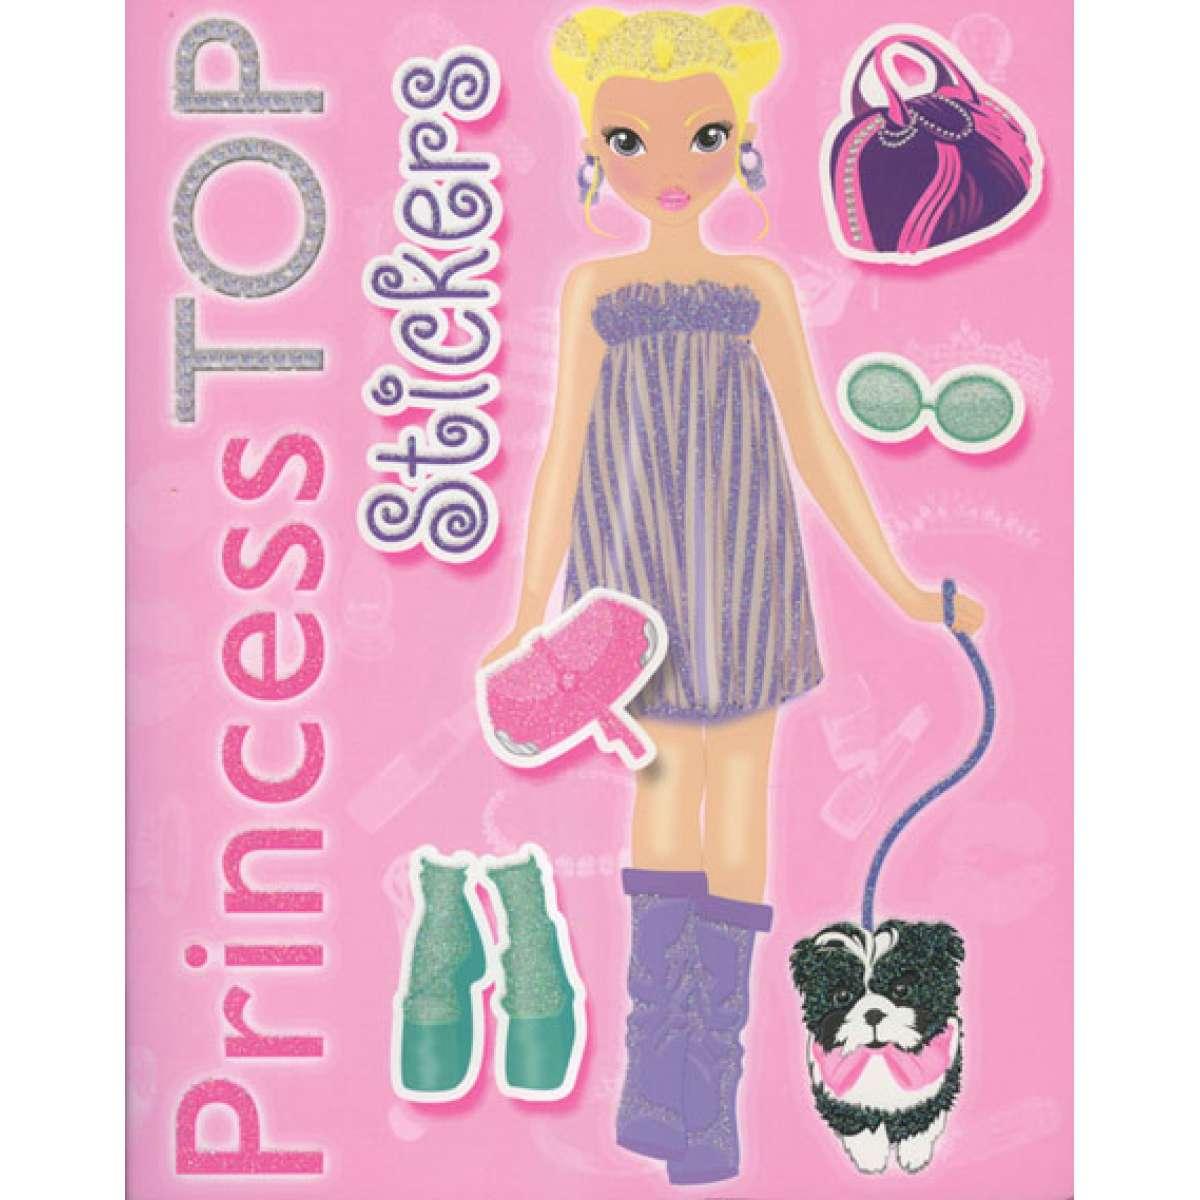 TOP PRINCESS - STICKERS ROZE 2